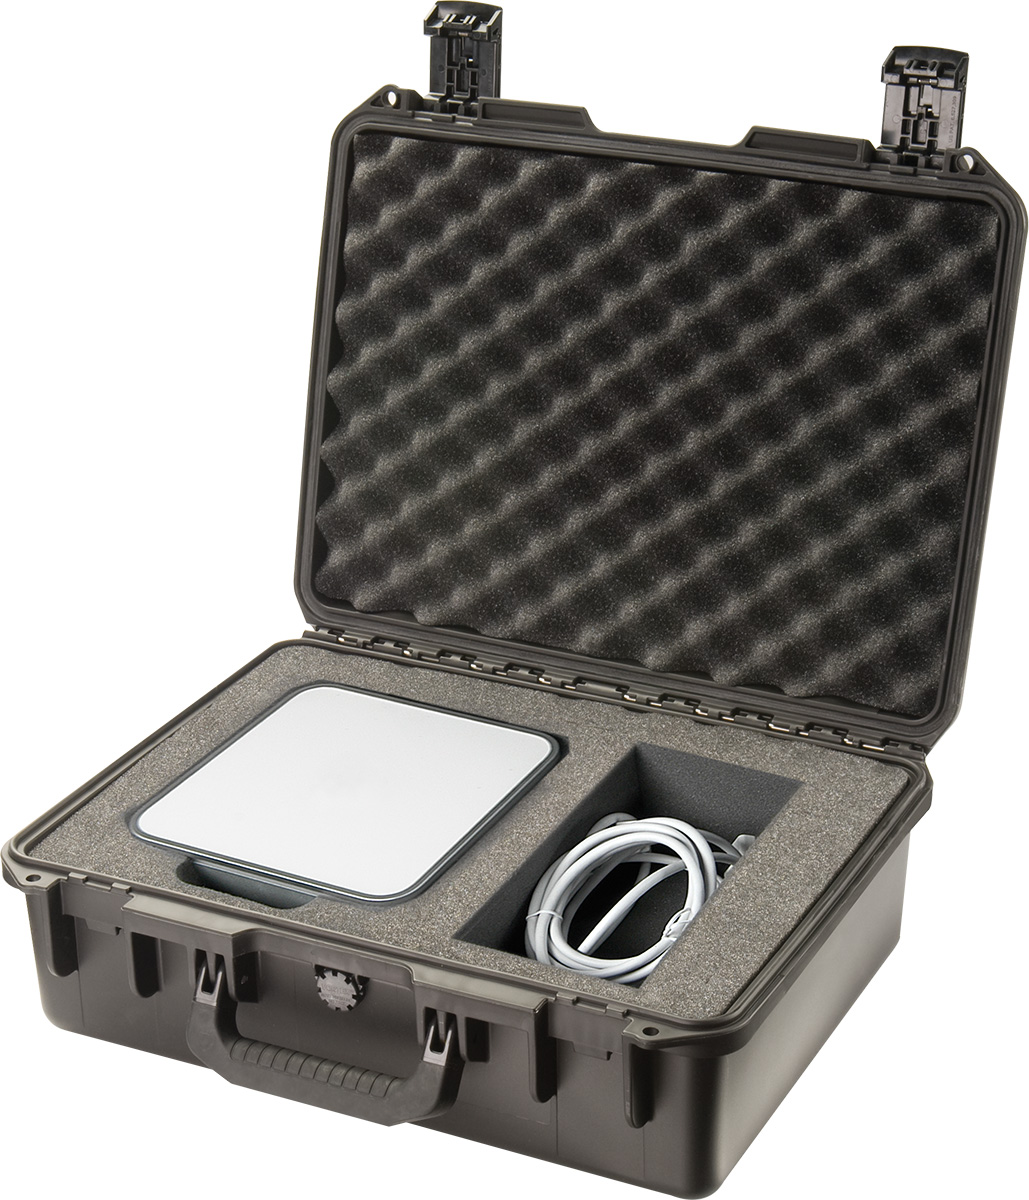 pelican im2400 storm hard drive case